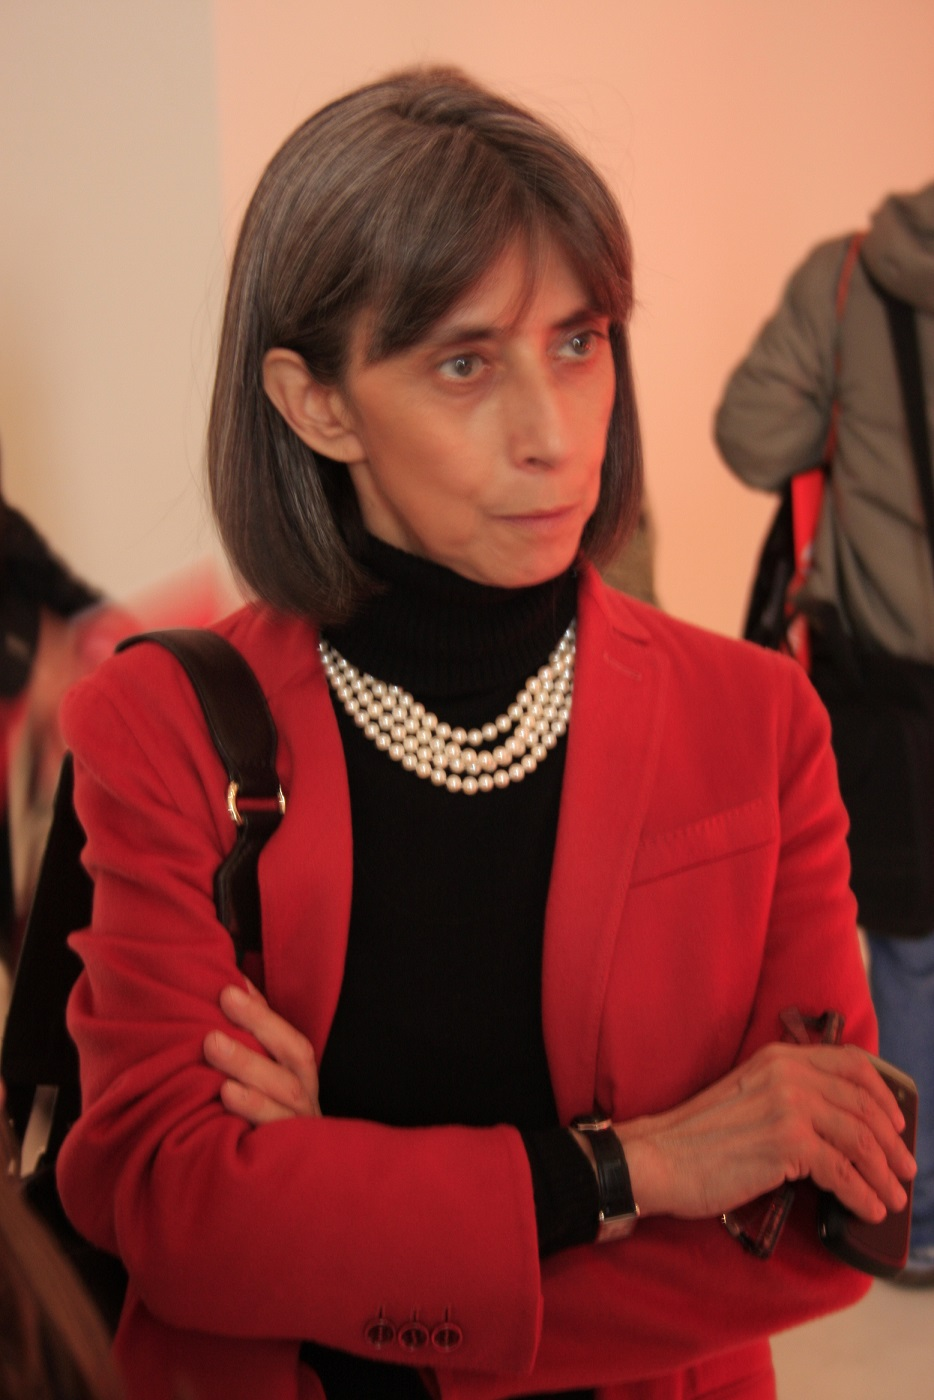 Rosanna Cappelli